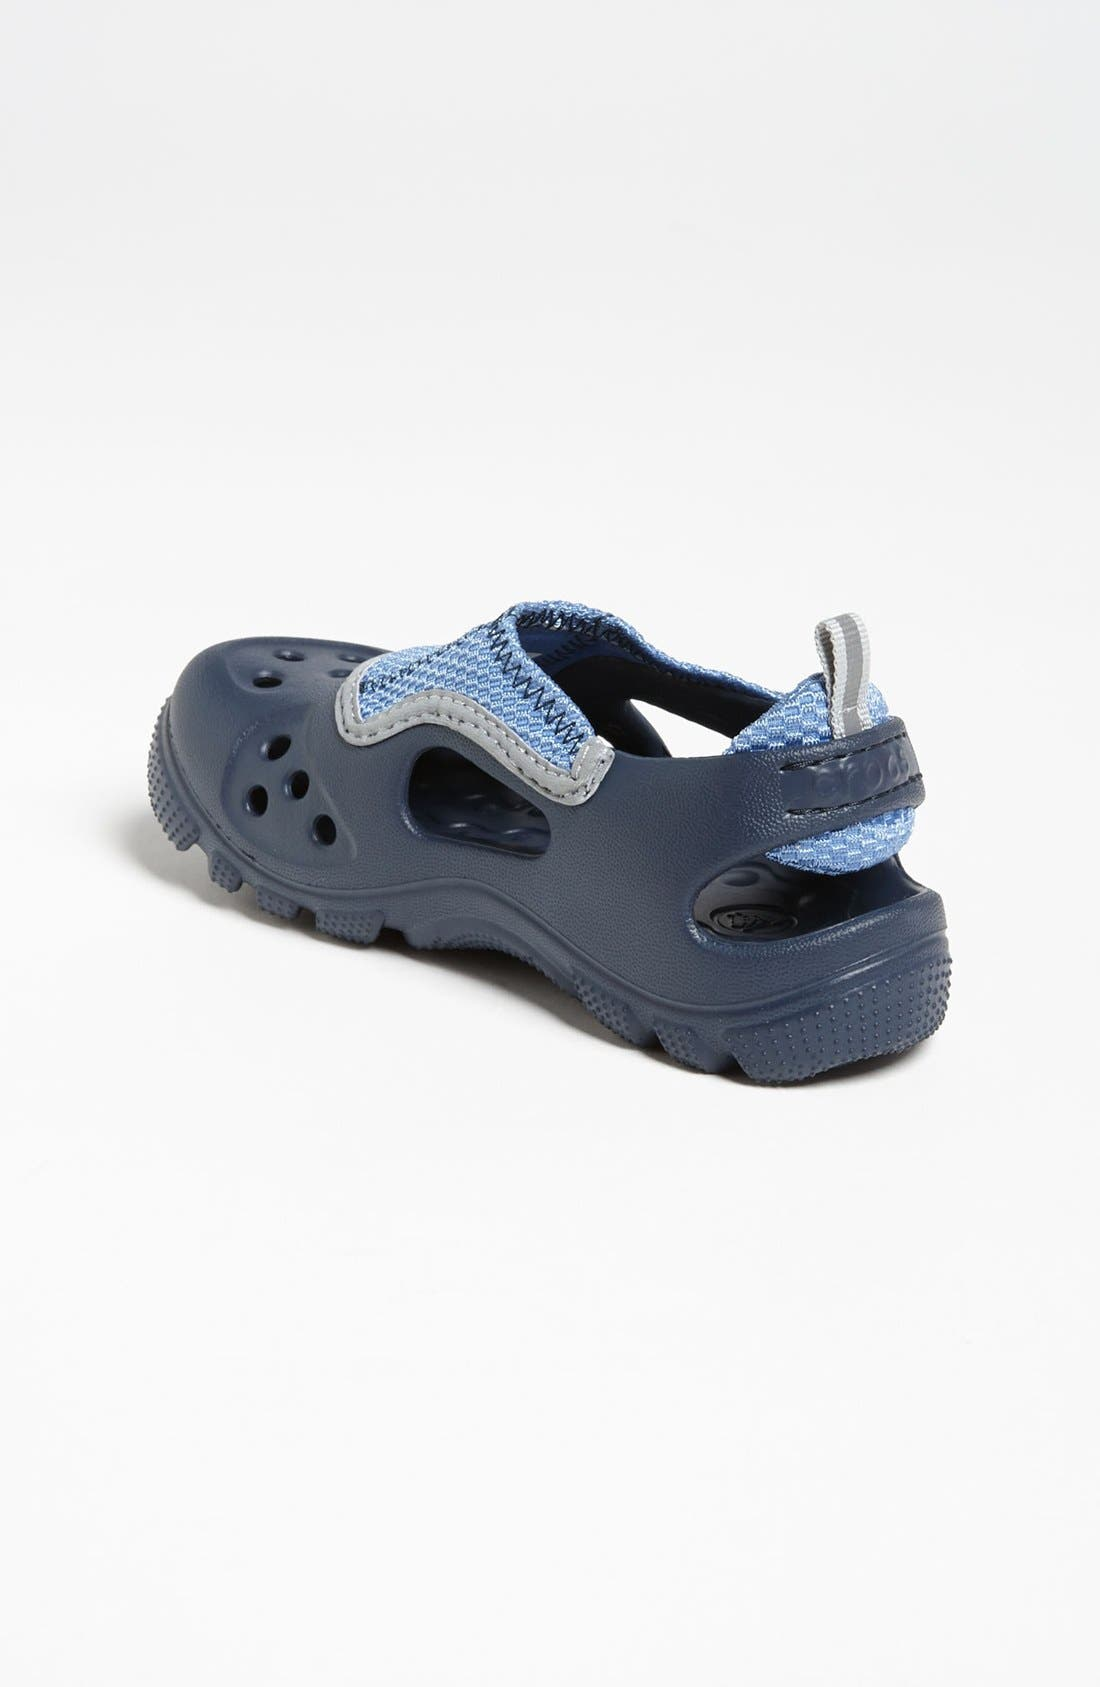 Alternate Image 2  - CROCS™ 'Micah II' Sandal (Walker & Toddler)